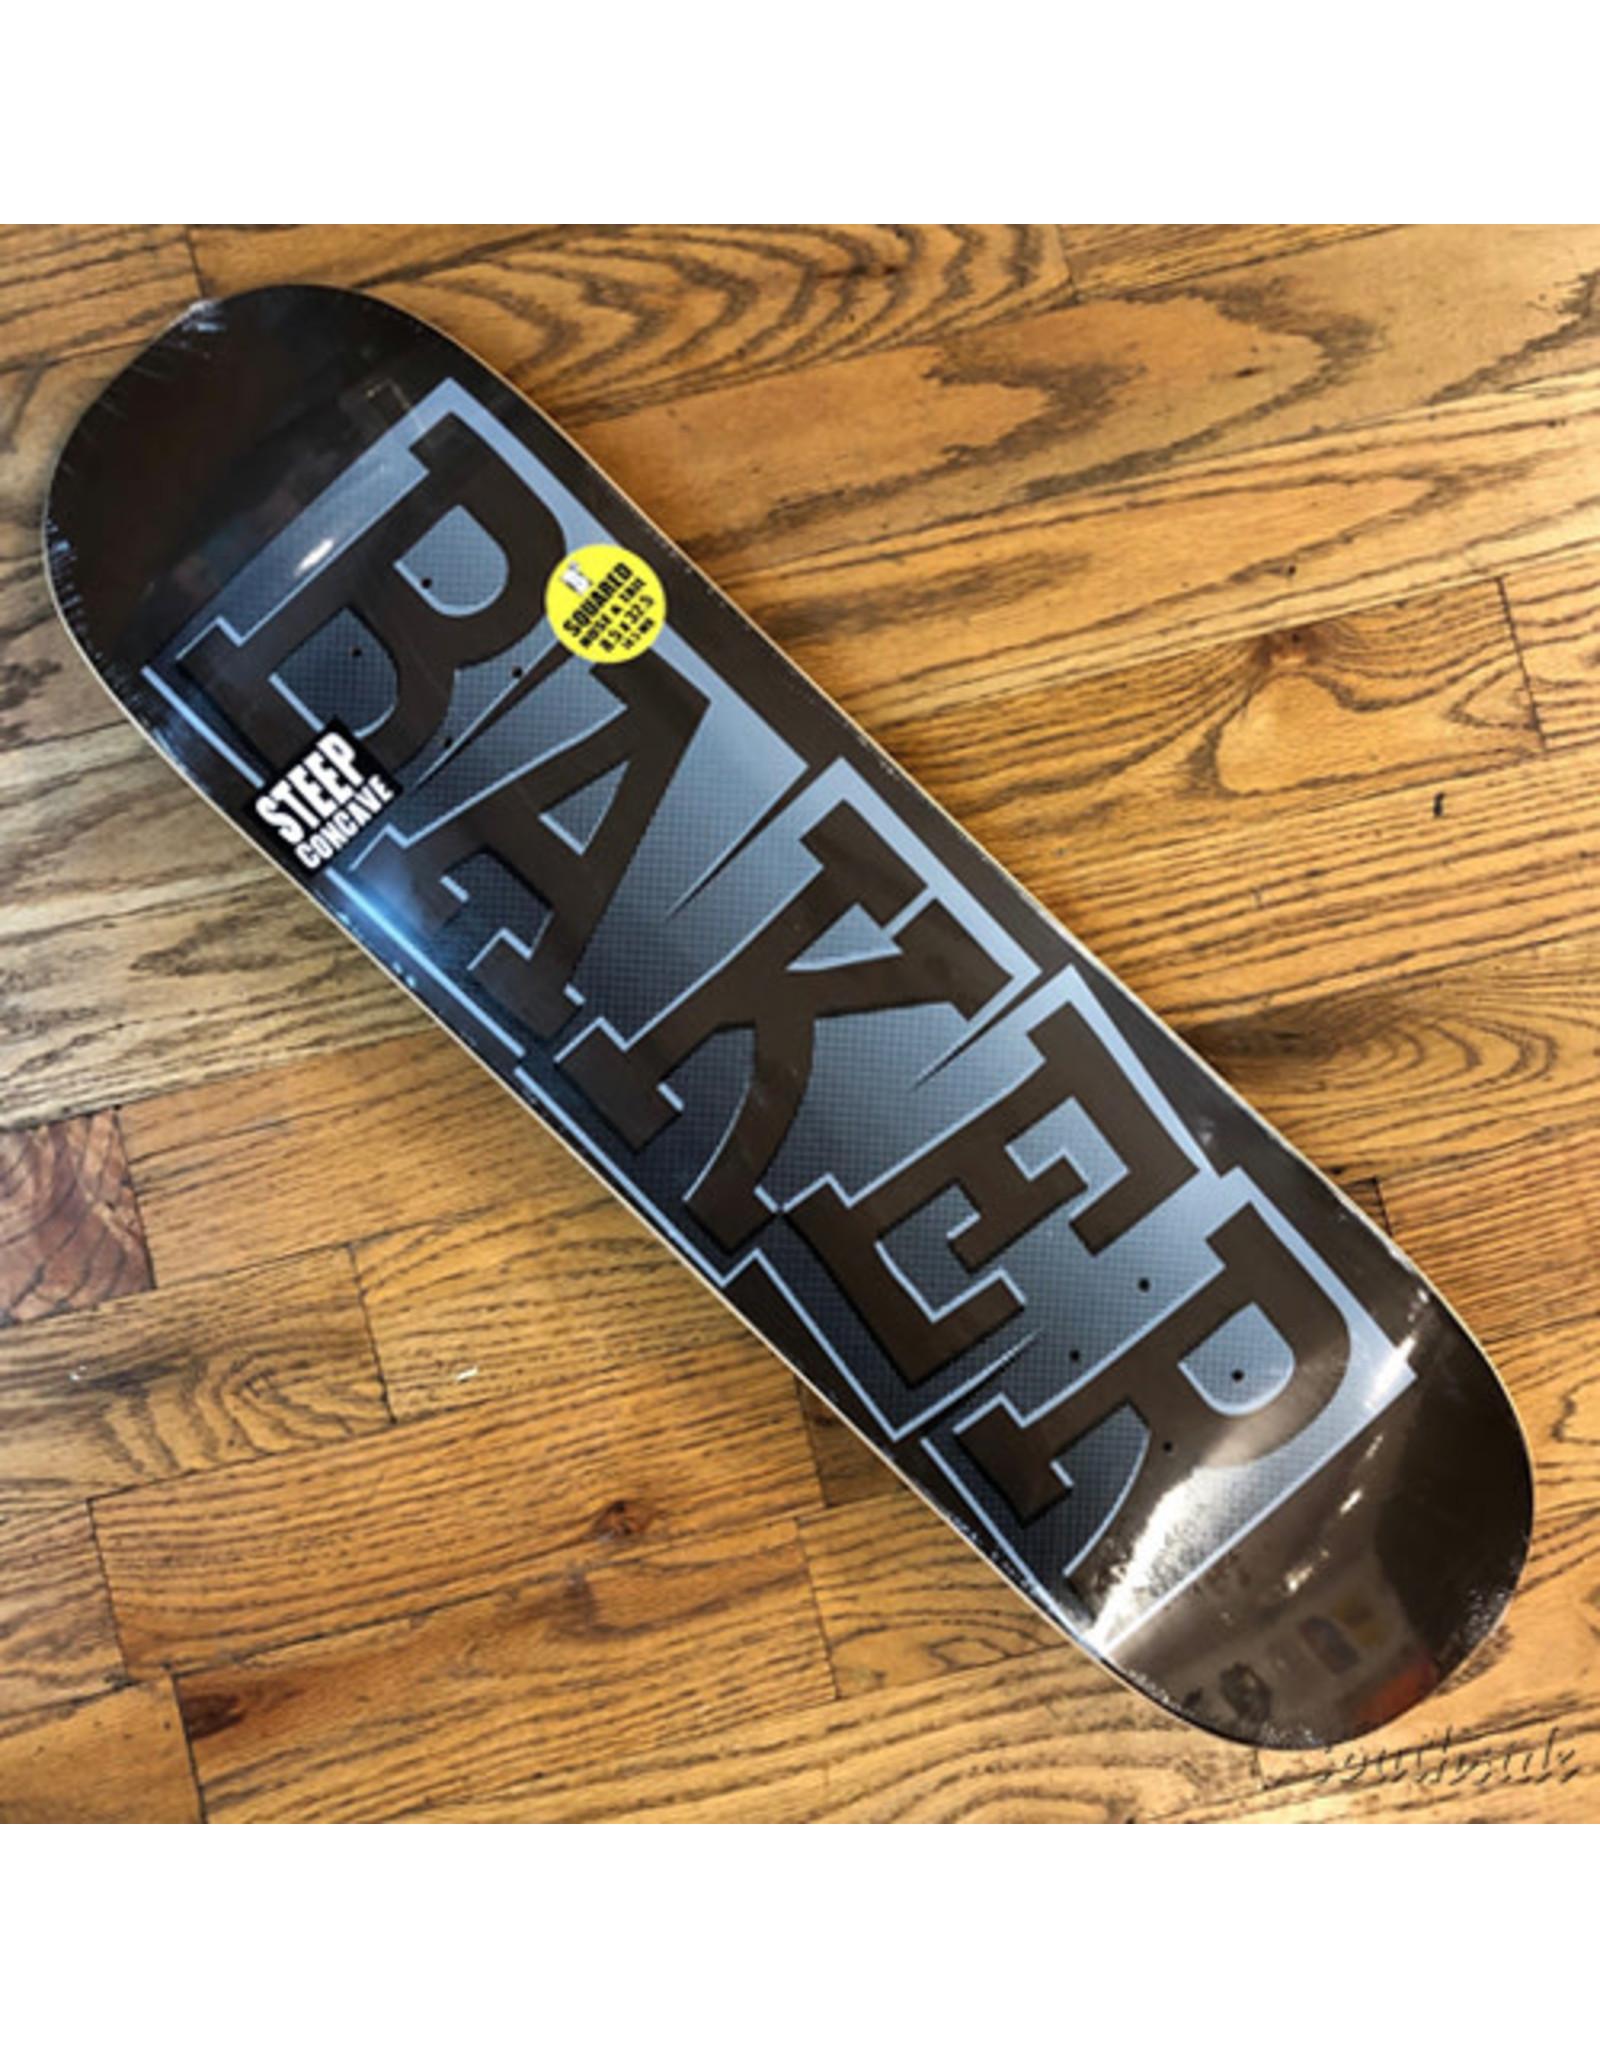 Baker Deck Rowan Zorilla Ribbon Name 8.5x32.3 Squared Shape